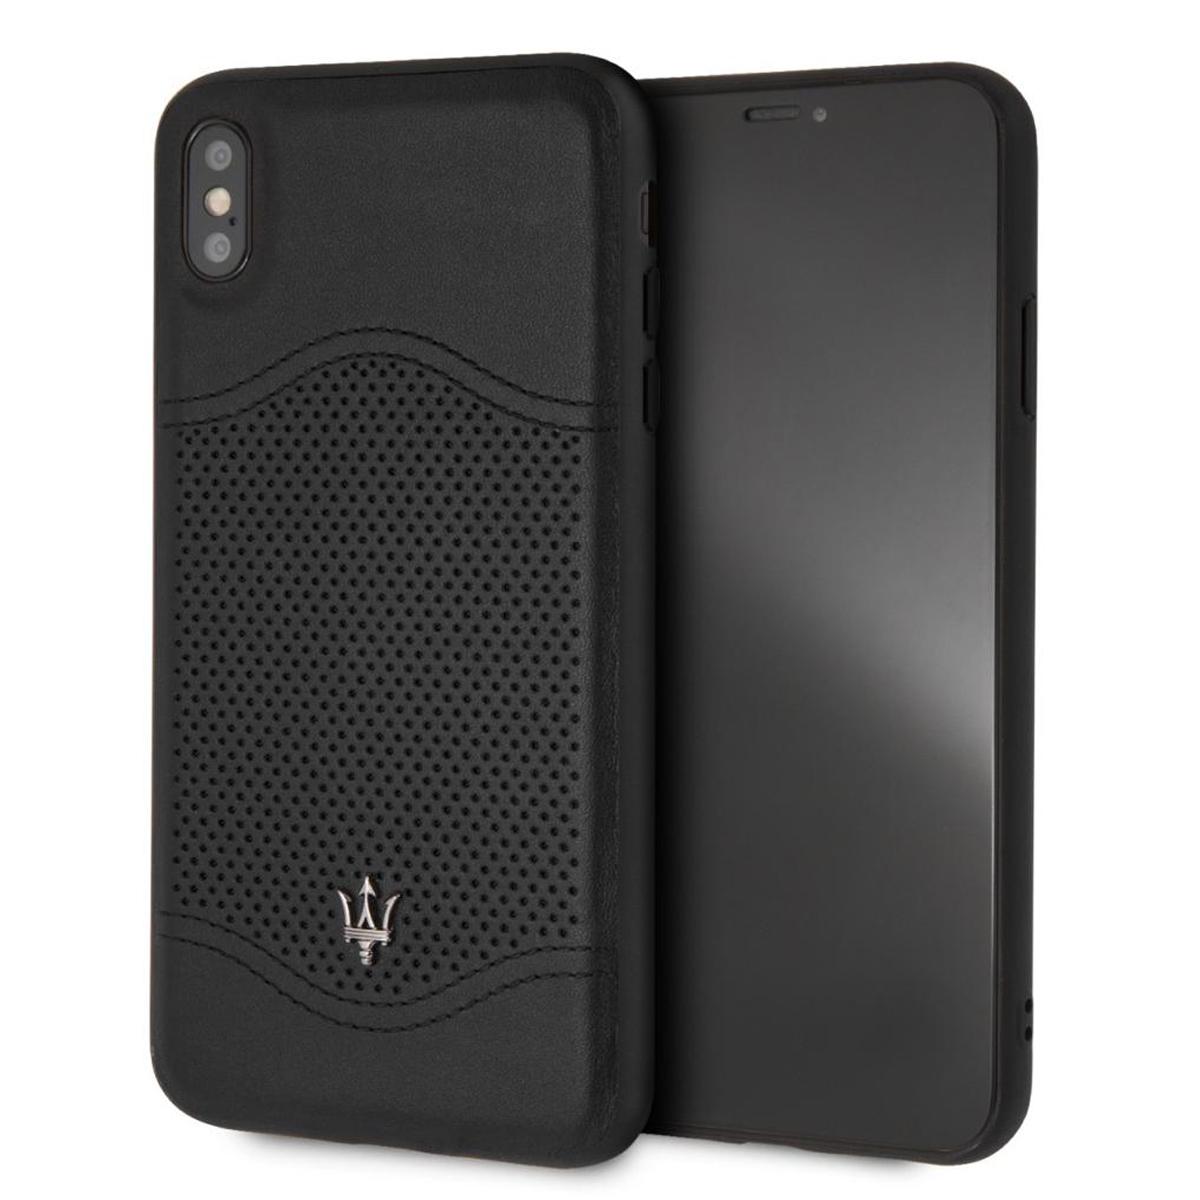 کاور   سی جی موبایل کد 33301 مناسب برای گوشی موبایل اپل iphone xs max    thumb 2 5